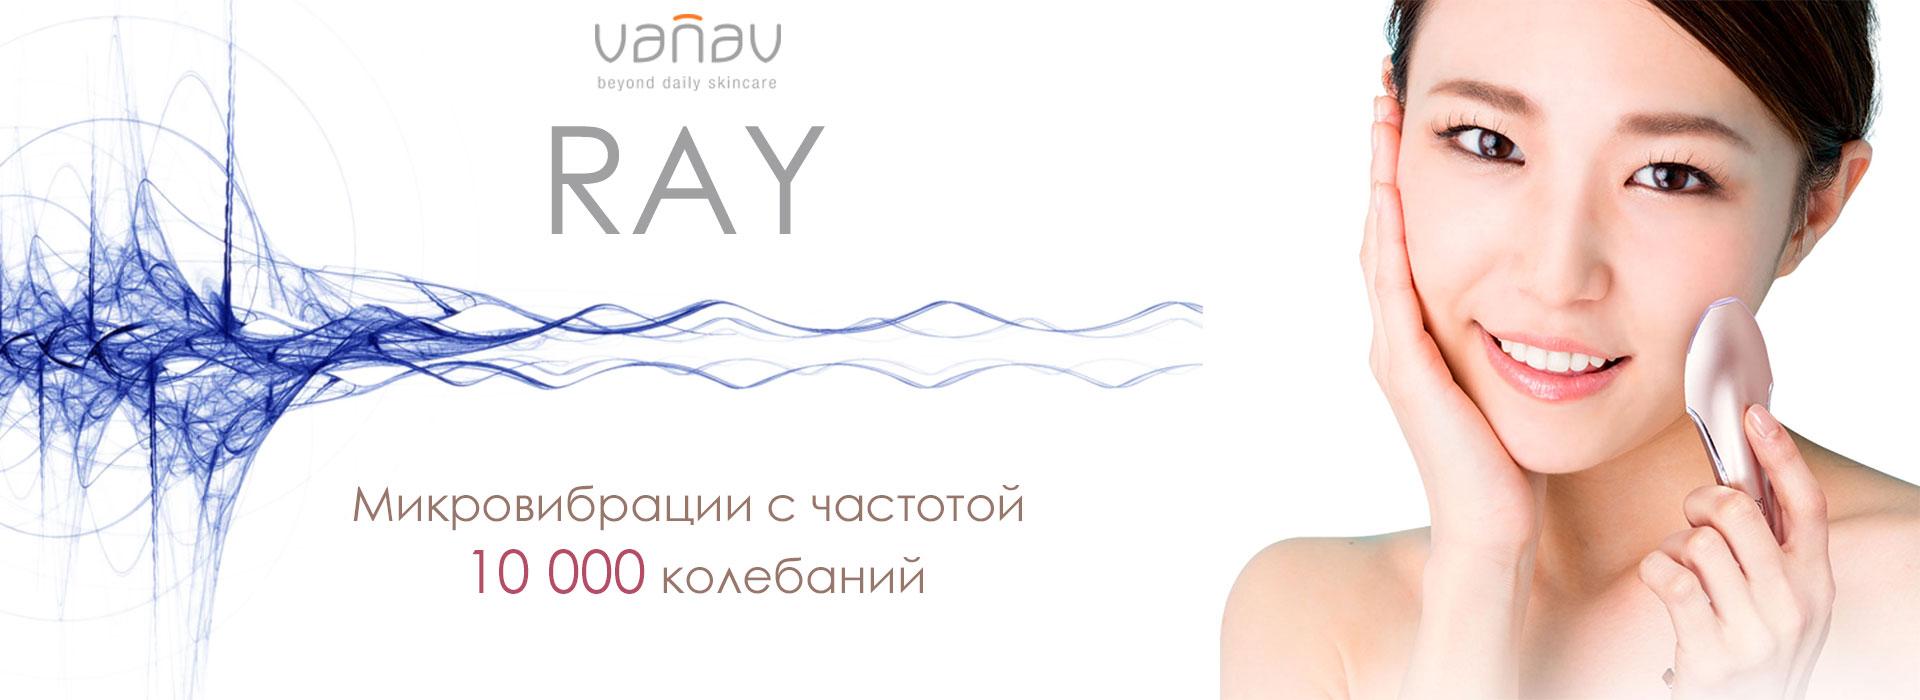 Микровибрации массажер VANAV Ray